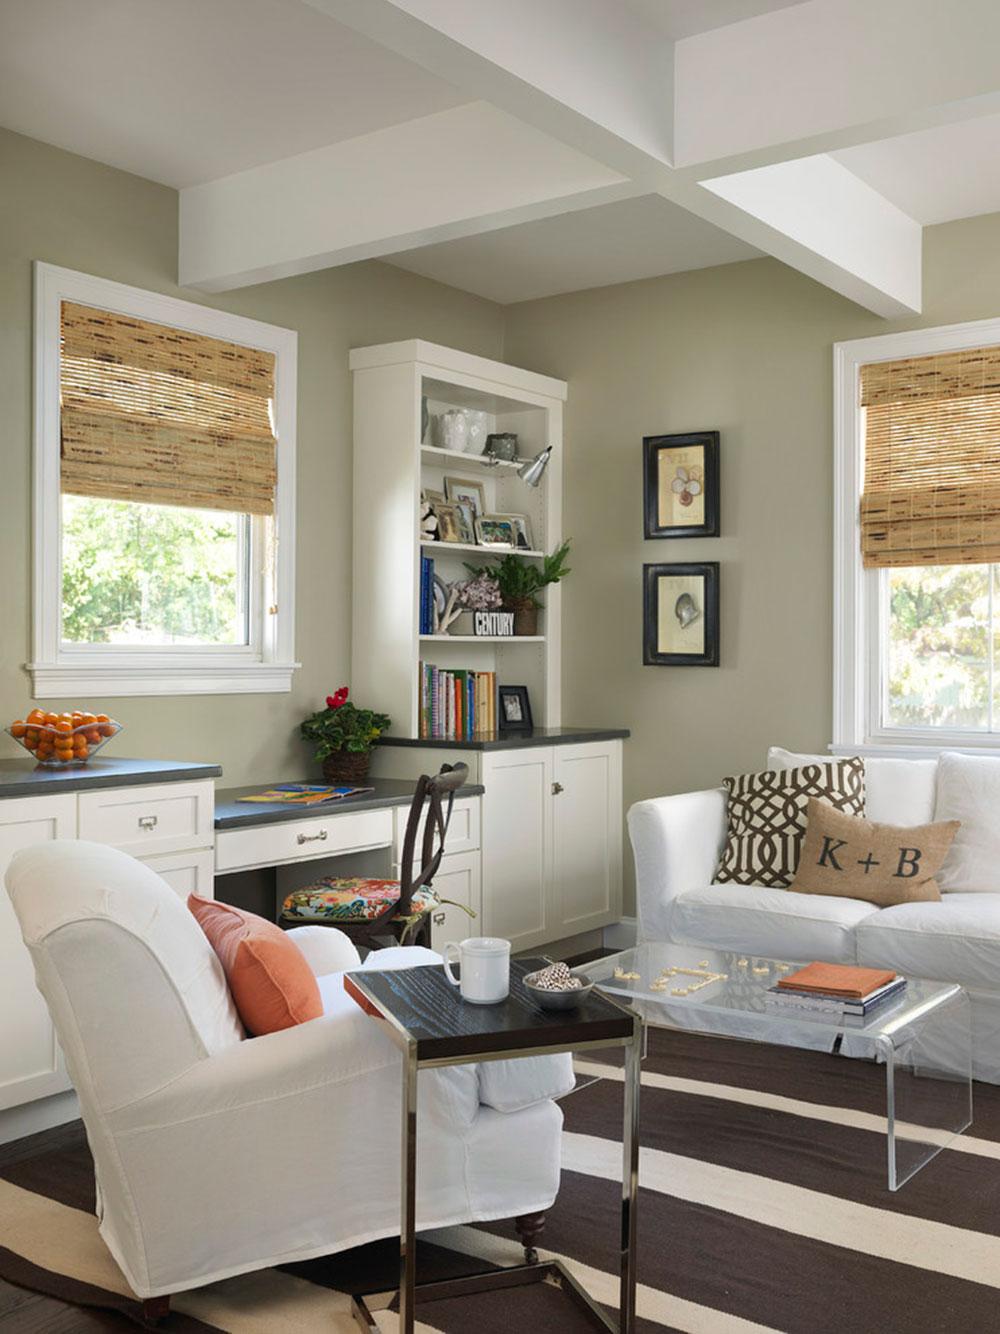 Bon Neutral Color Palette Interior Design Is Still Popular4 Neutral